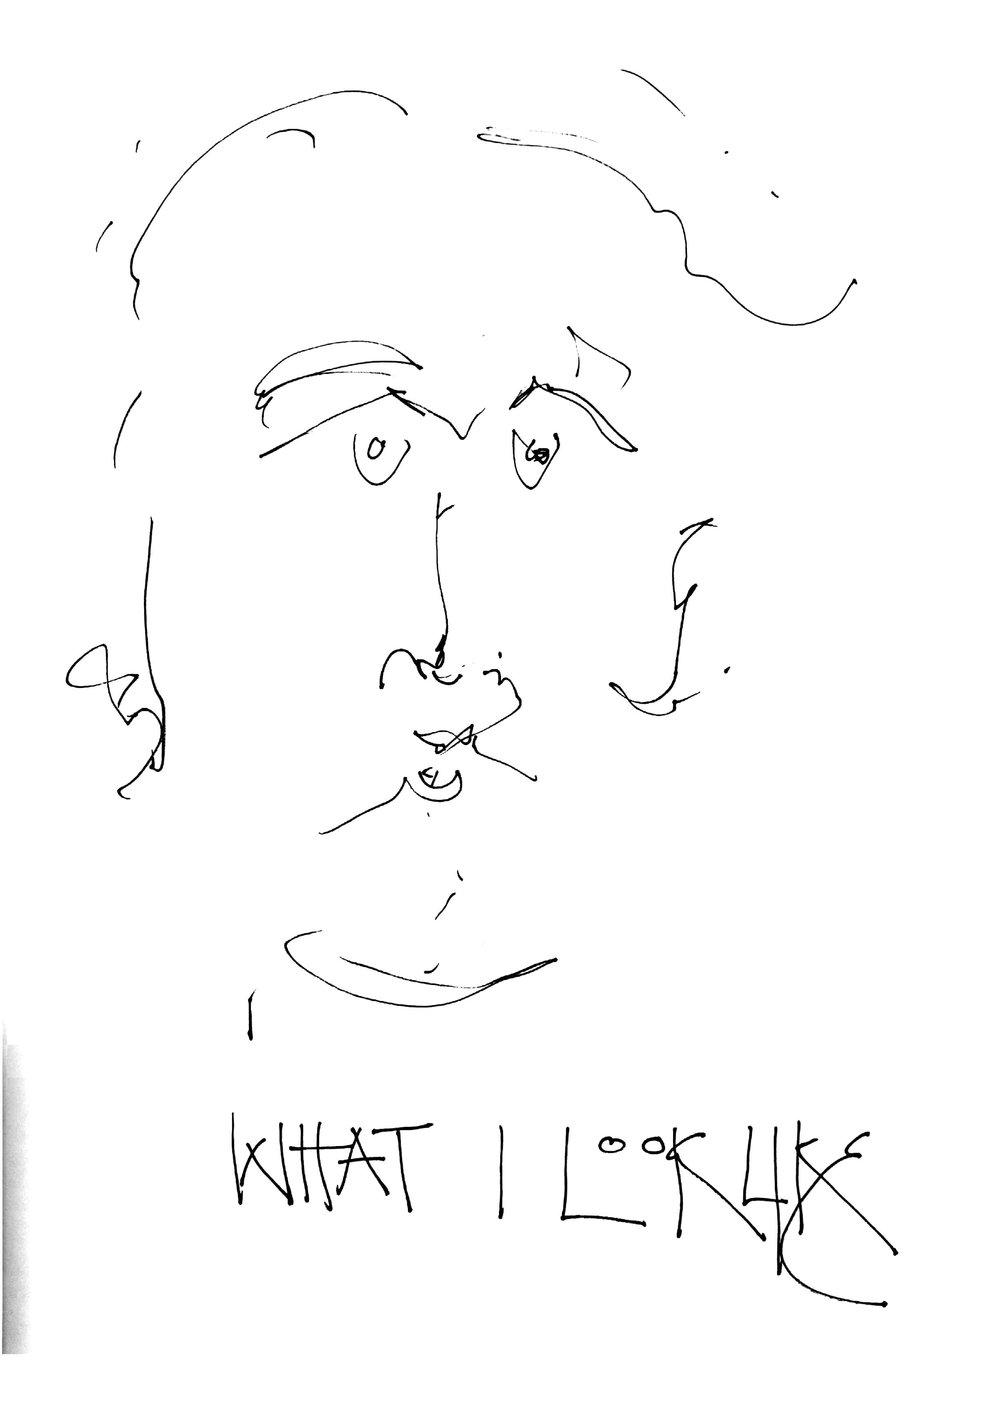 Jim Postell_II_09-19 11.19.59_Page_2.jpg